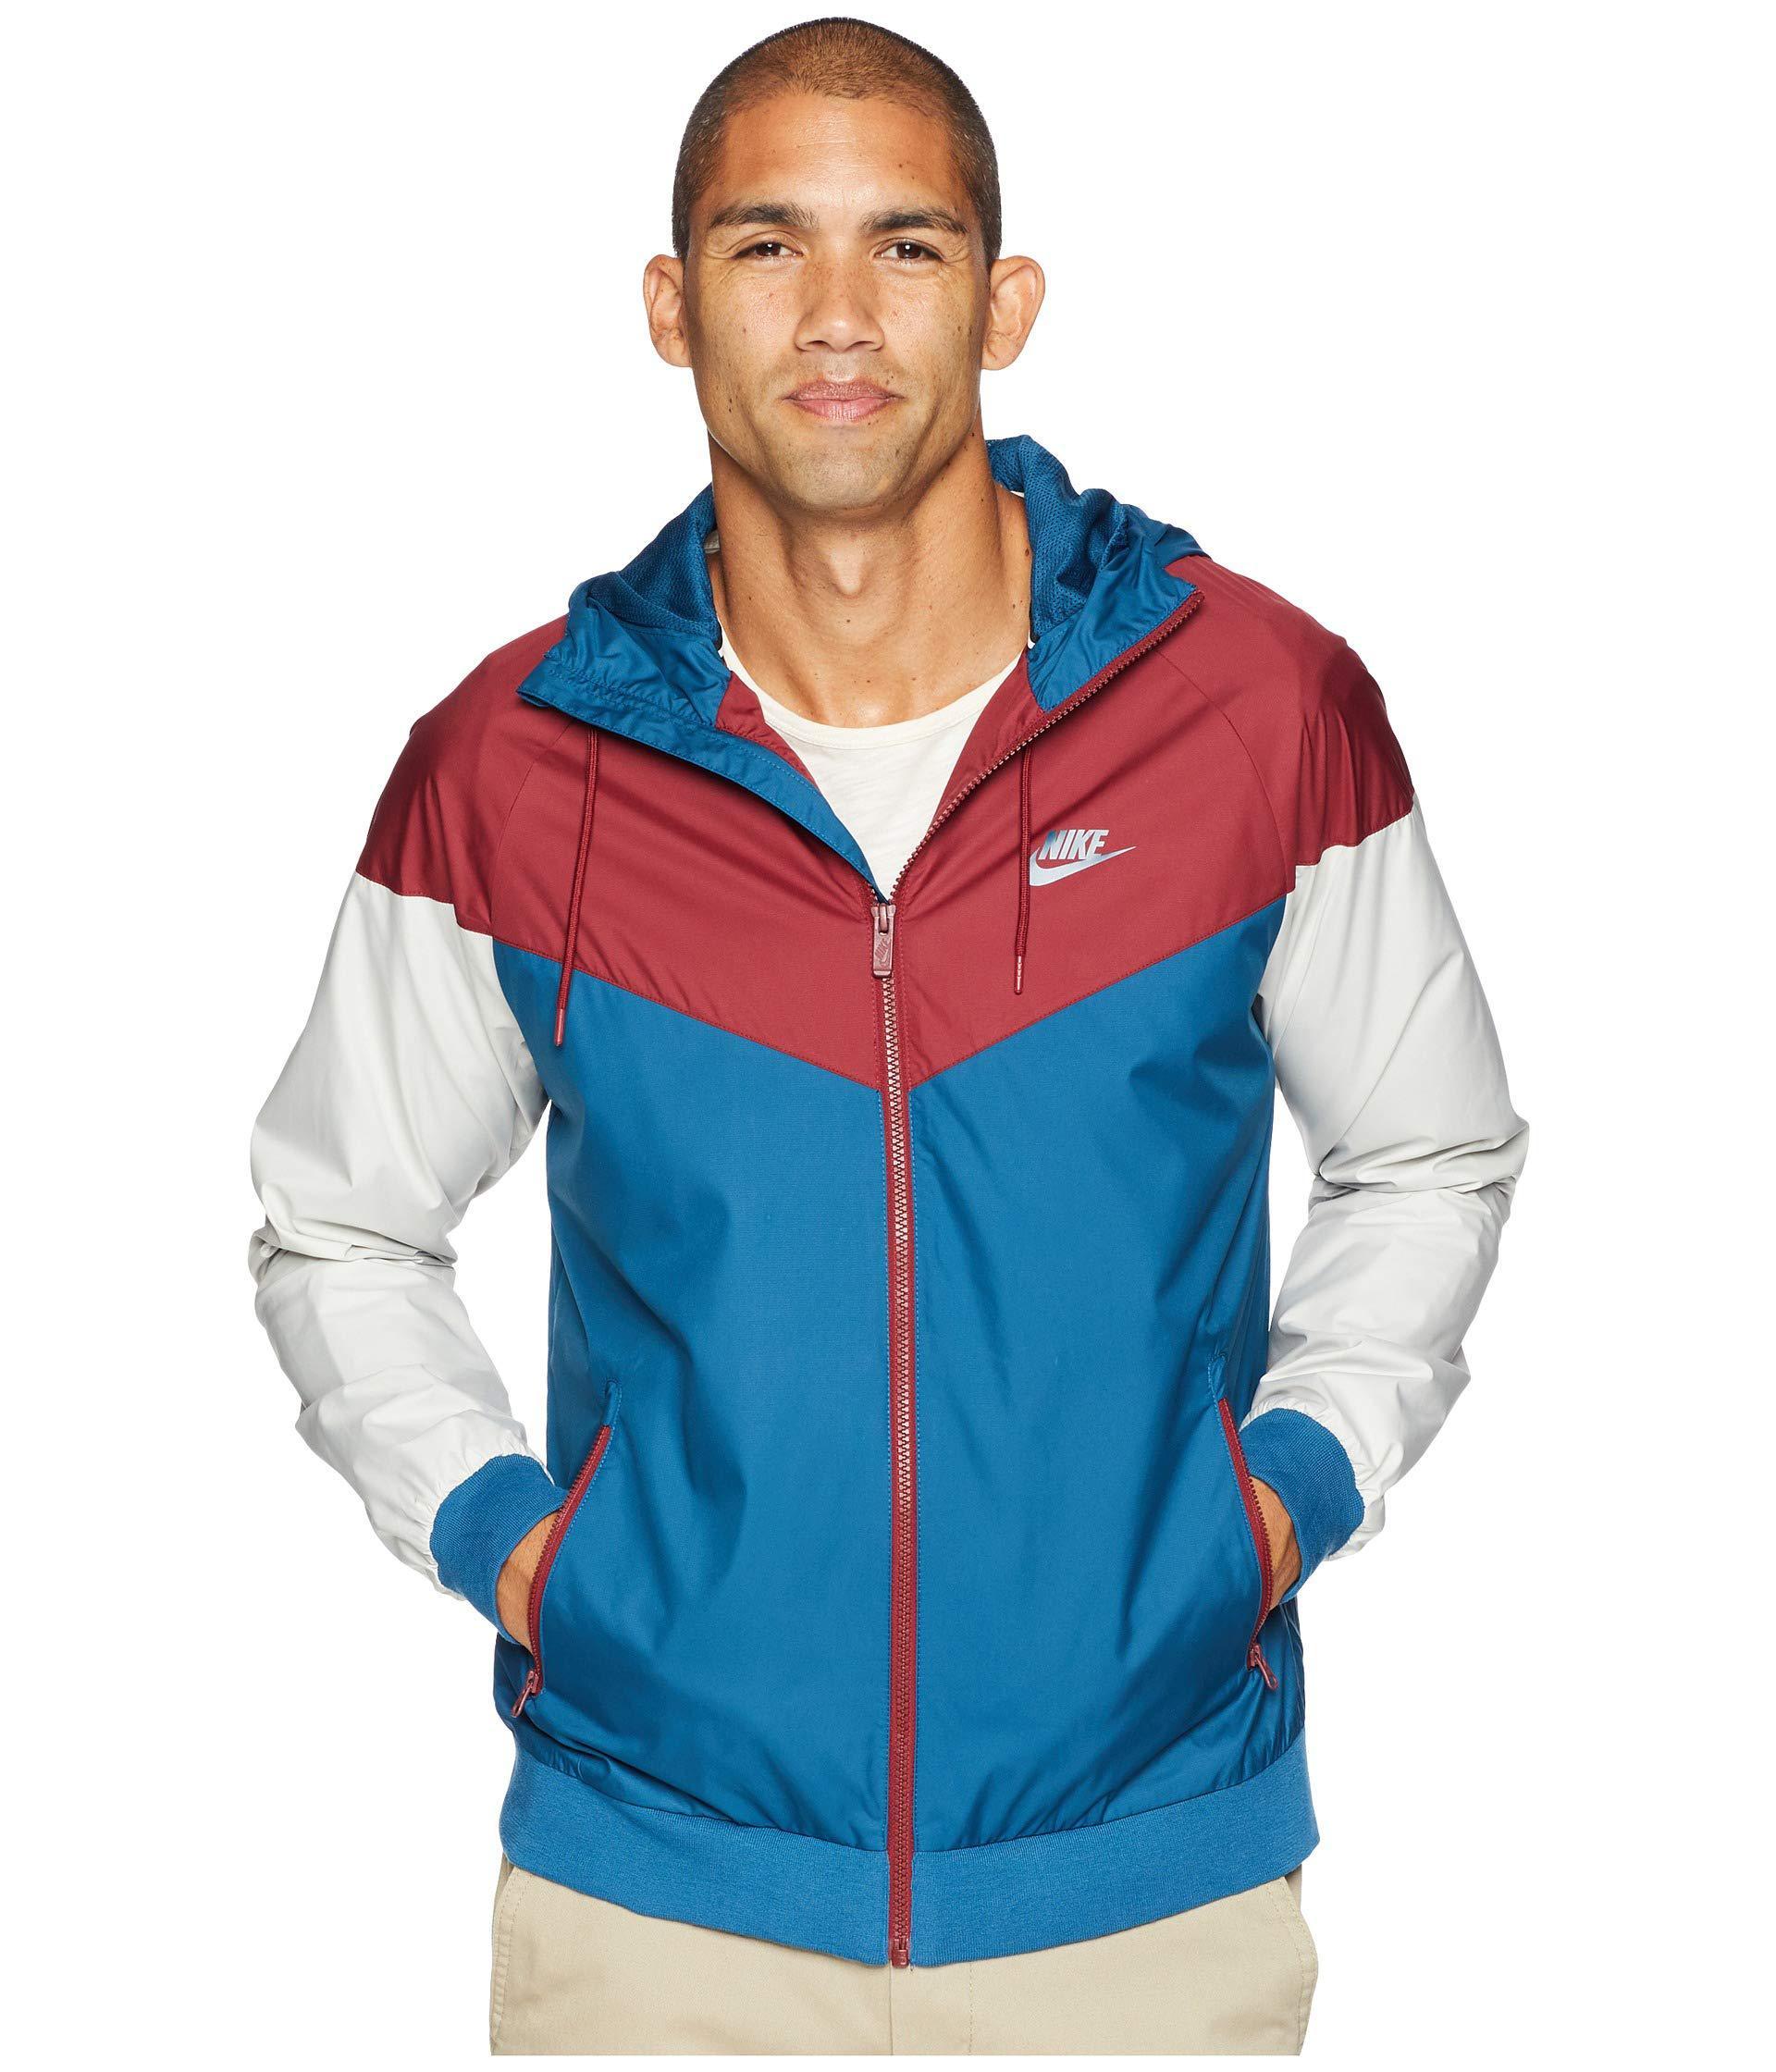 4a6b625f5f Lyst - Nike Sportwear Windrunner Jacket in Blue for Men - Save 8%